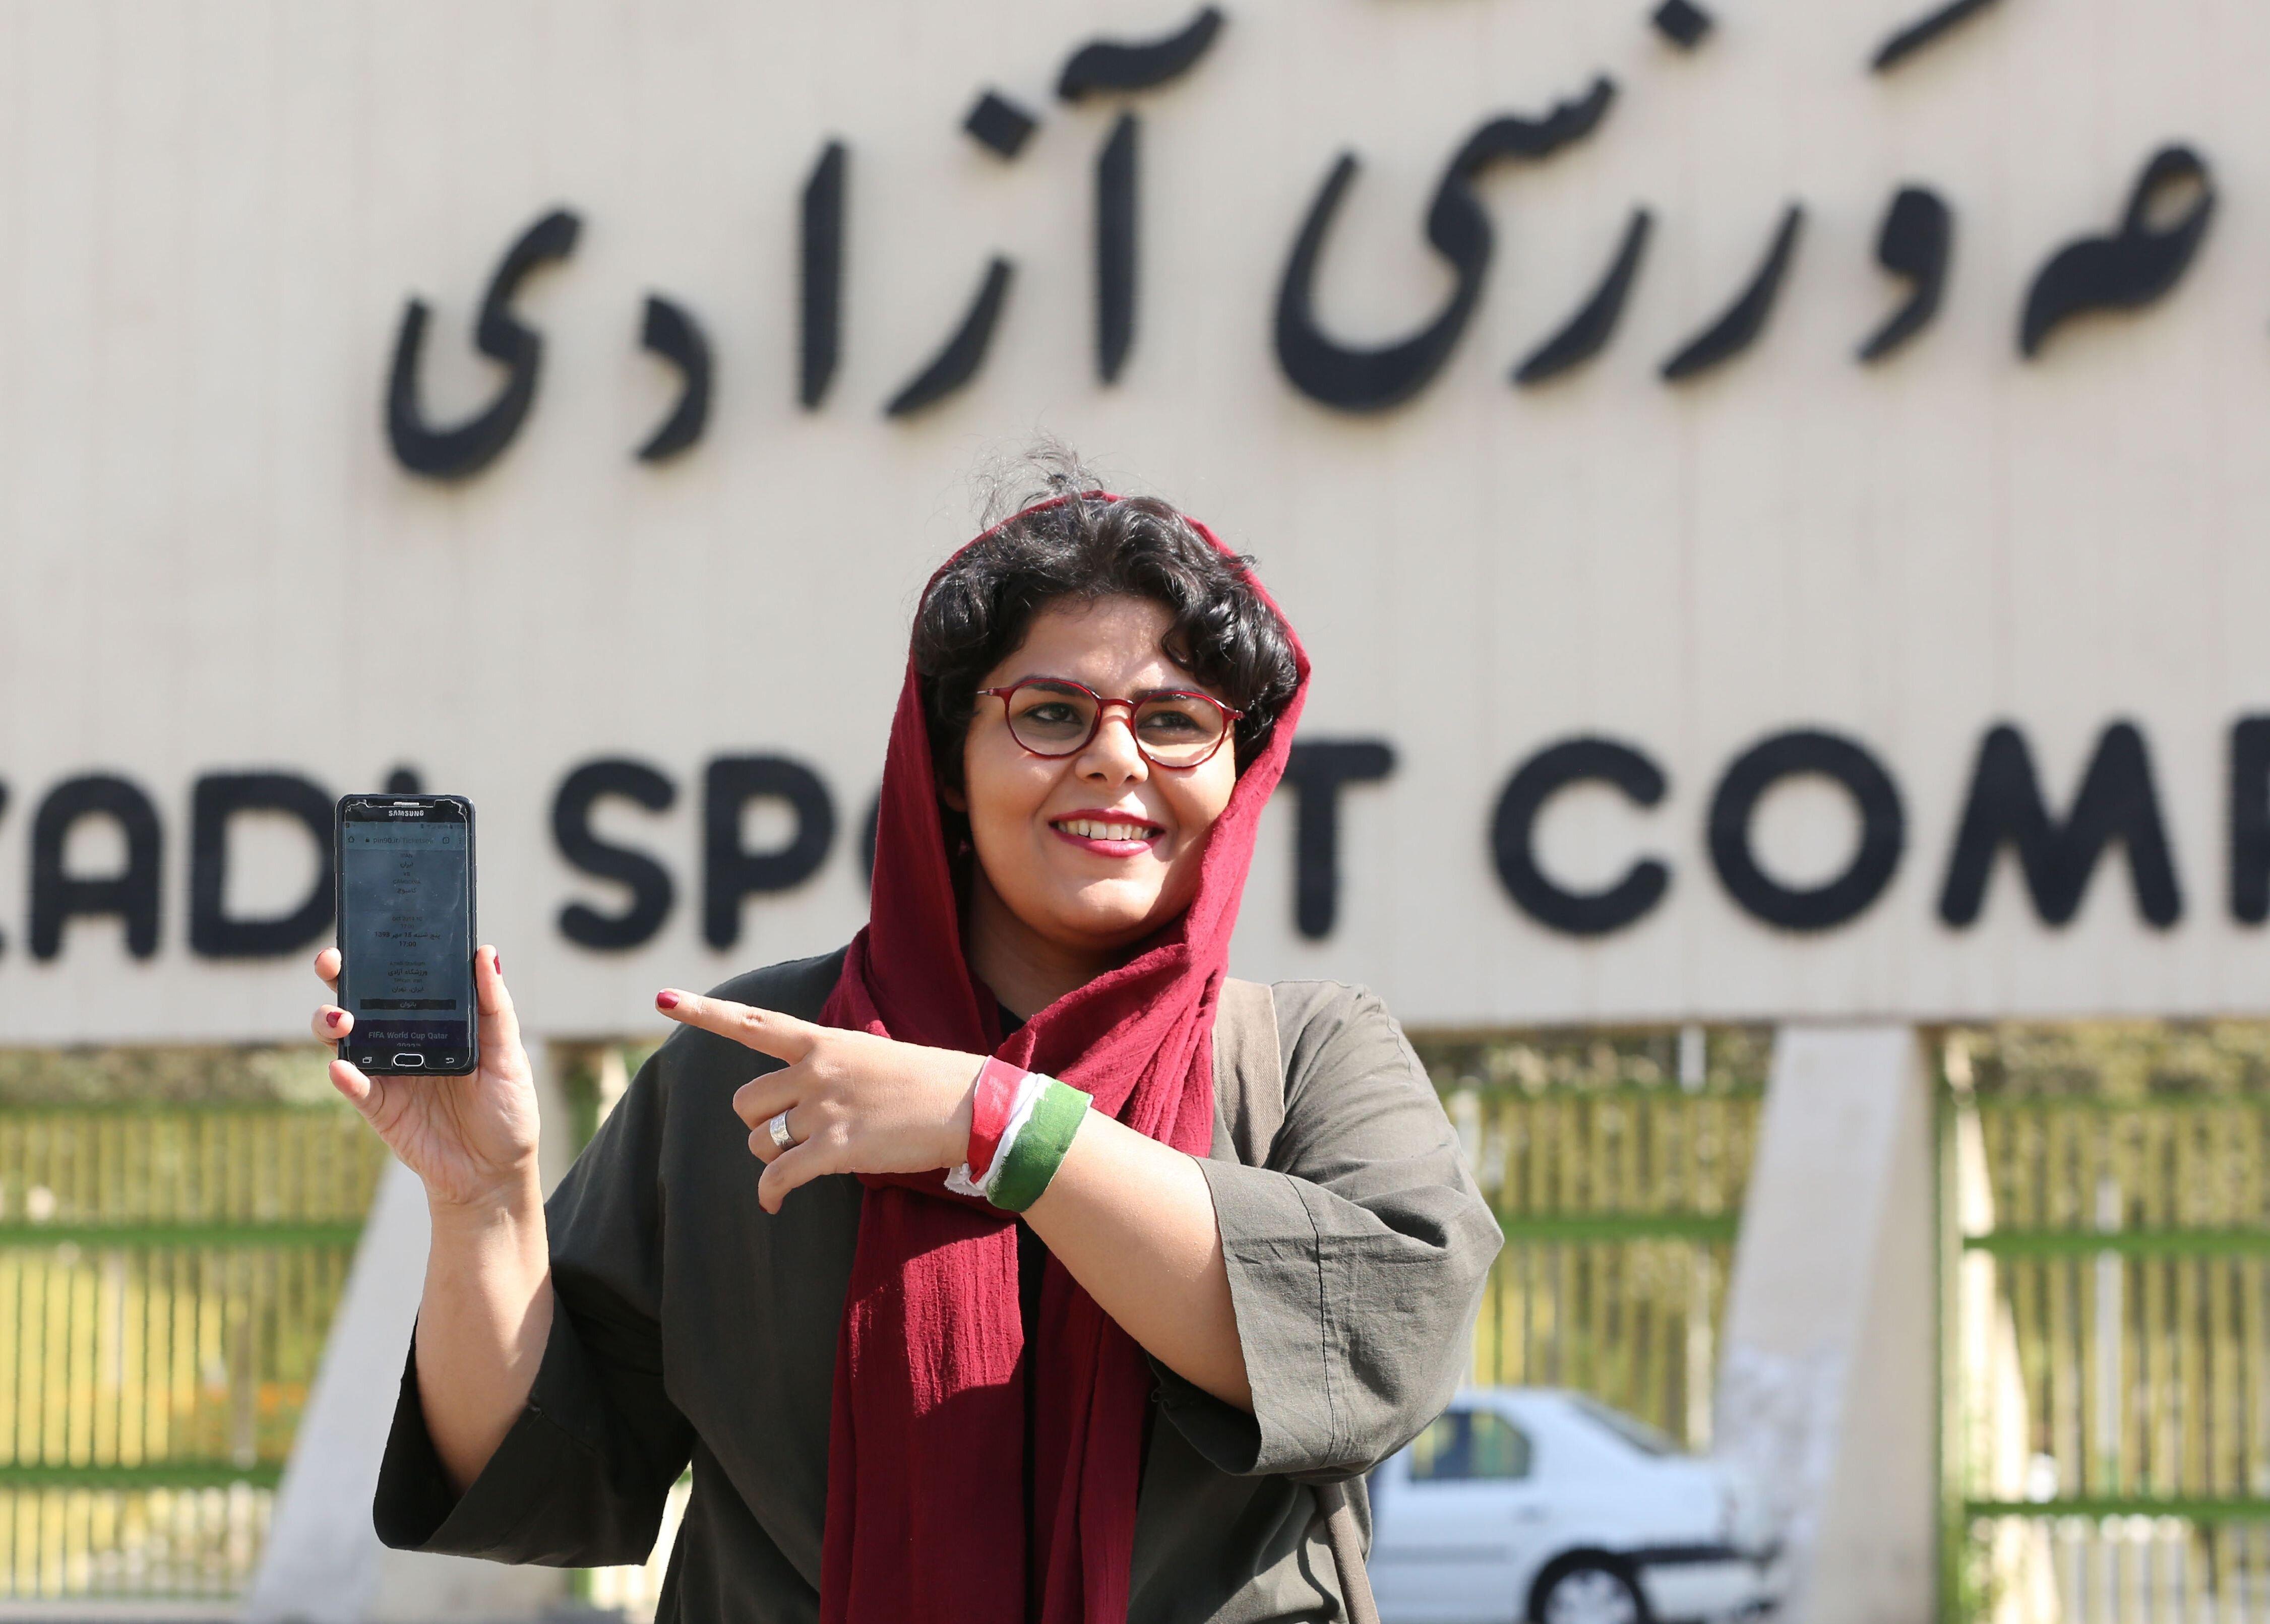 Rencontre avec Aude Sarkamari, franco-iranienne